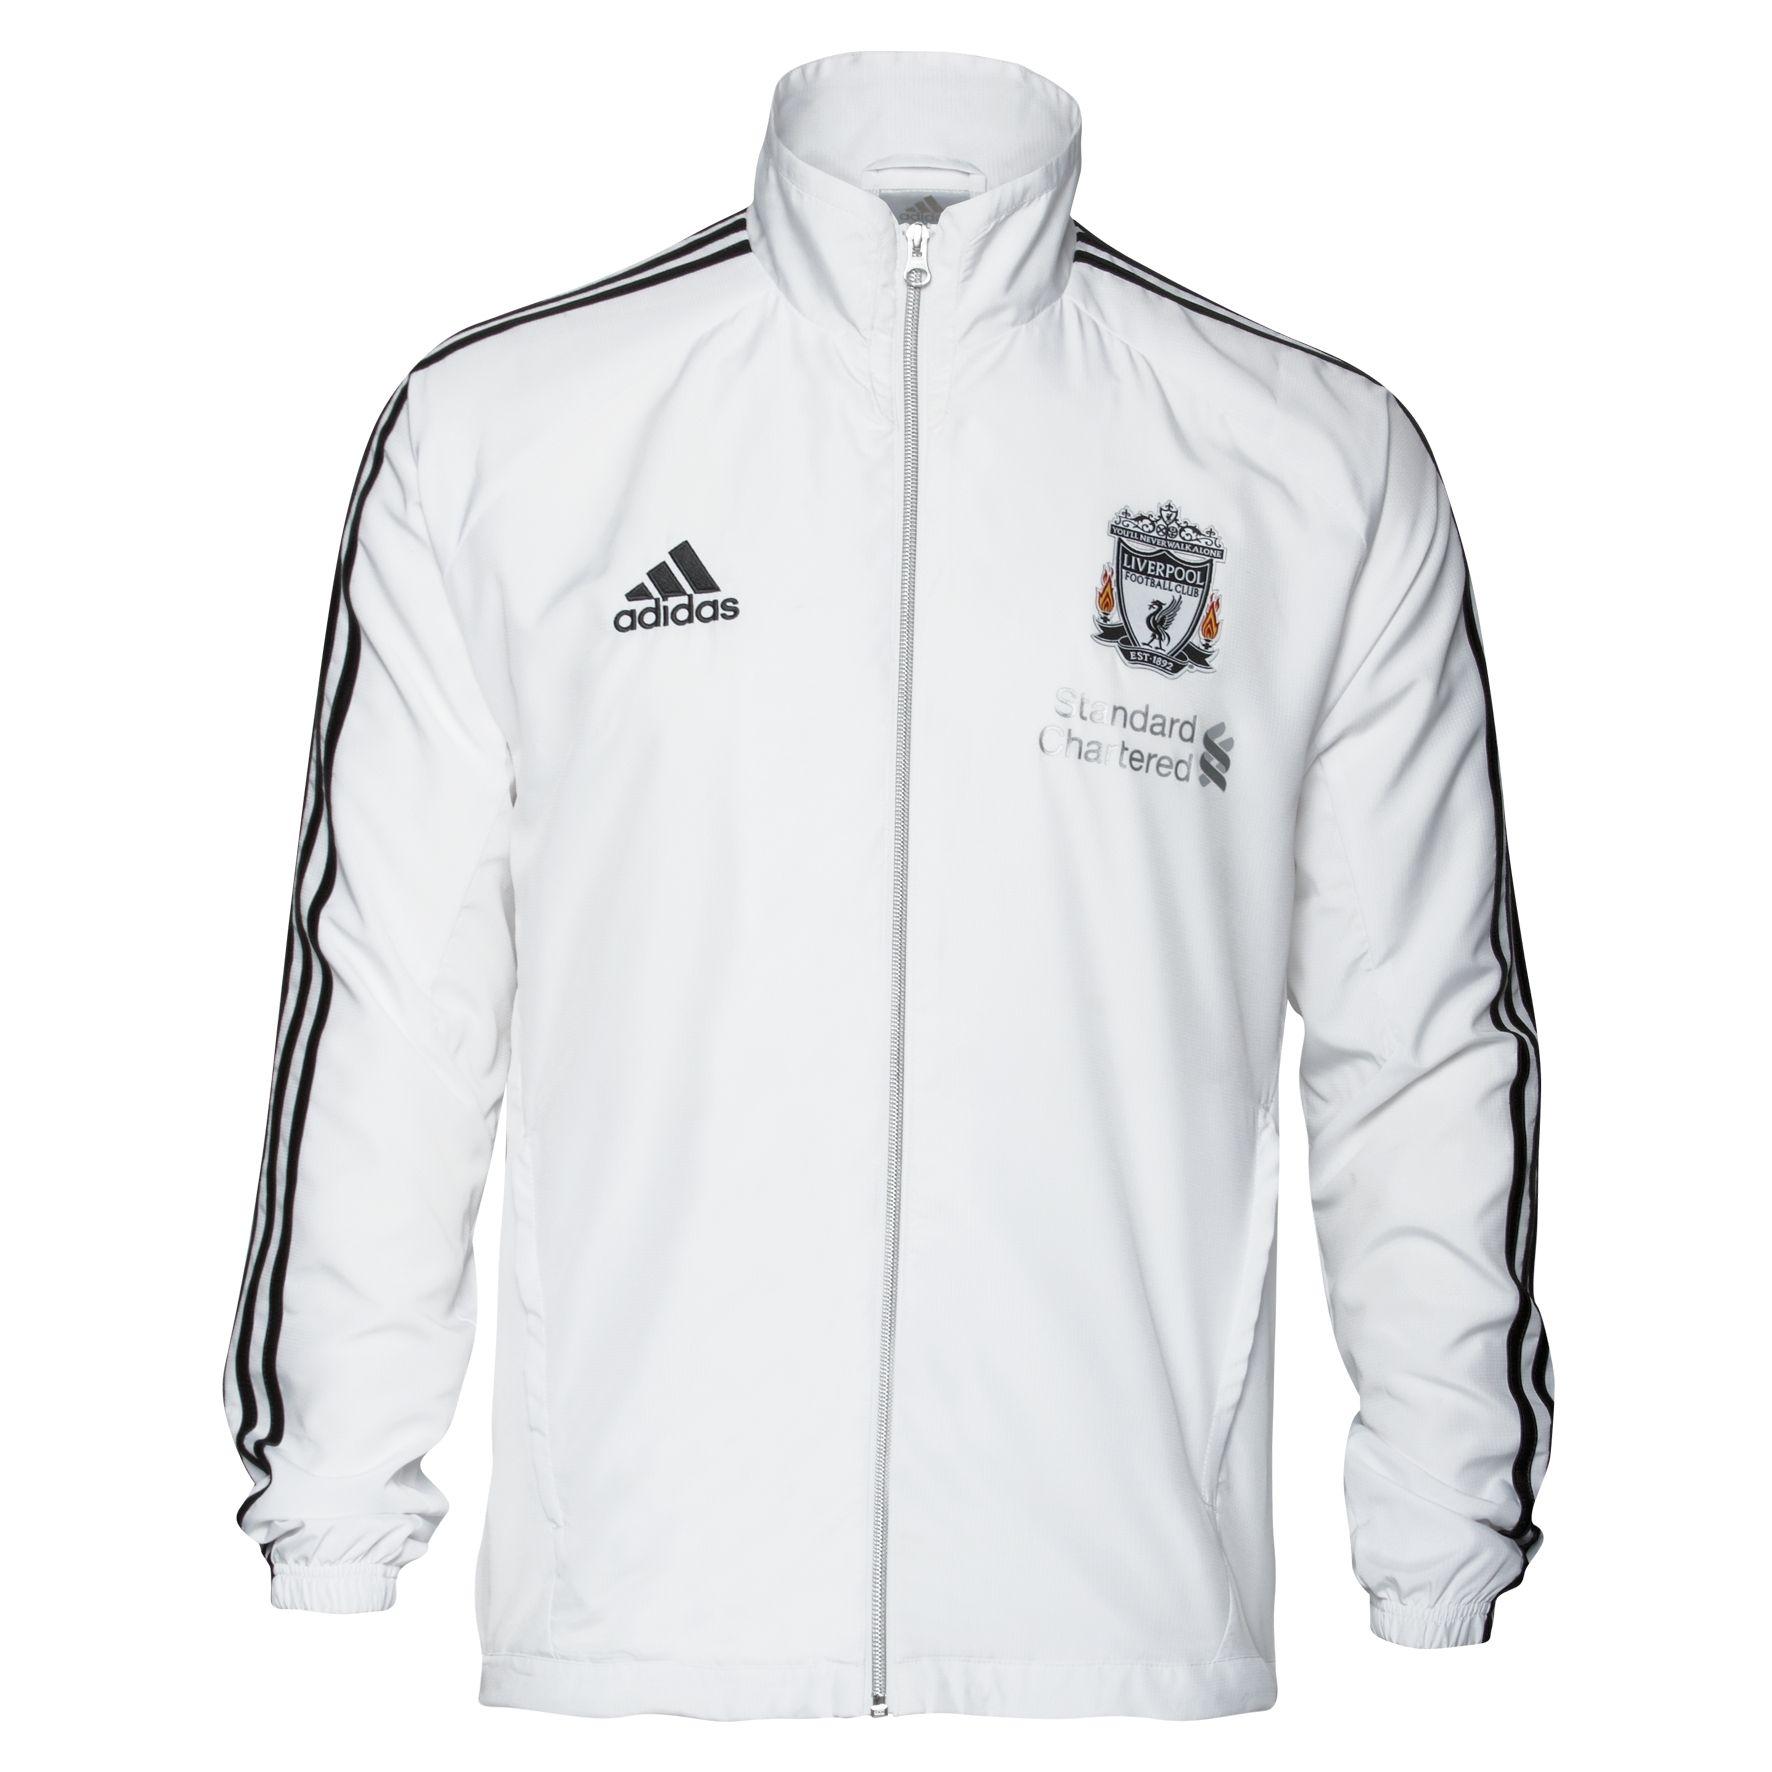 2011 12 Liverpool Adidas Presentation Jacket | LFC